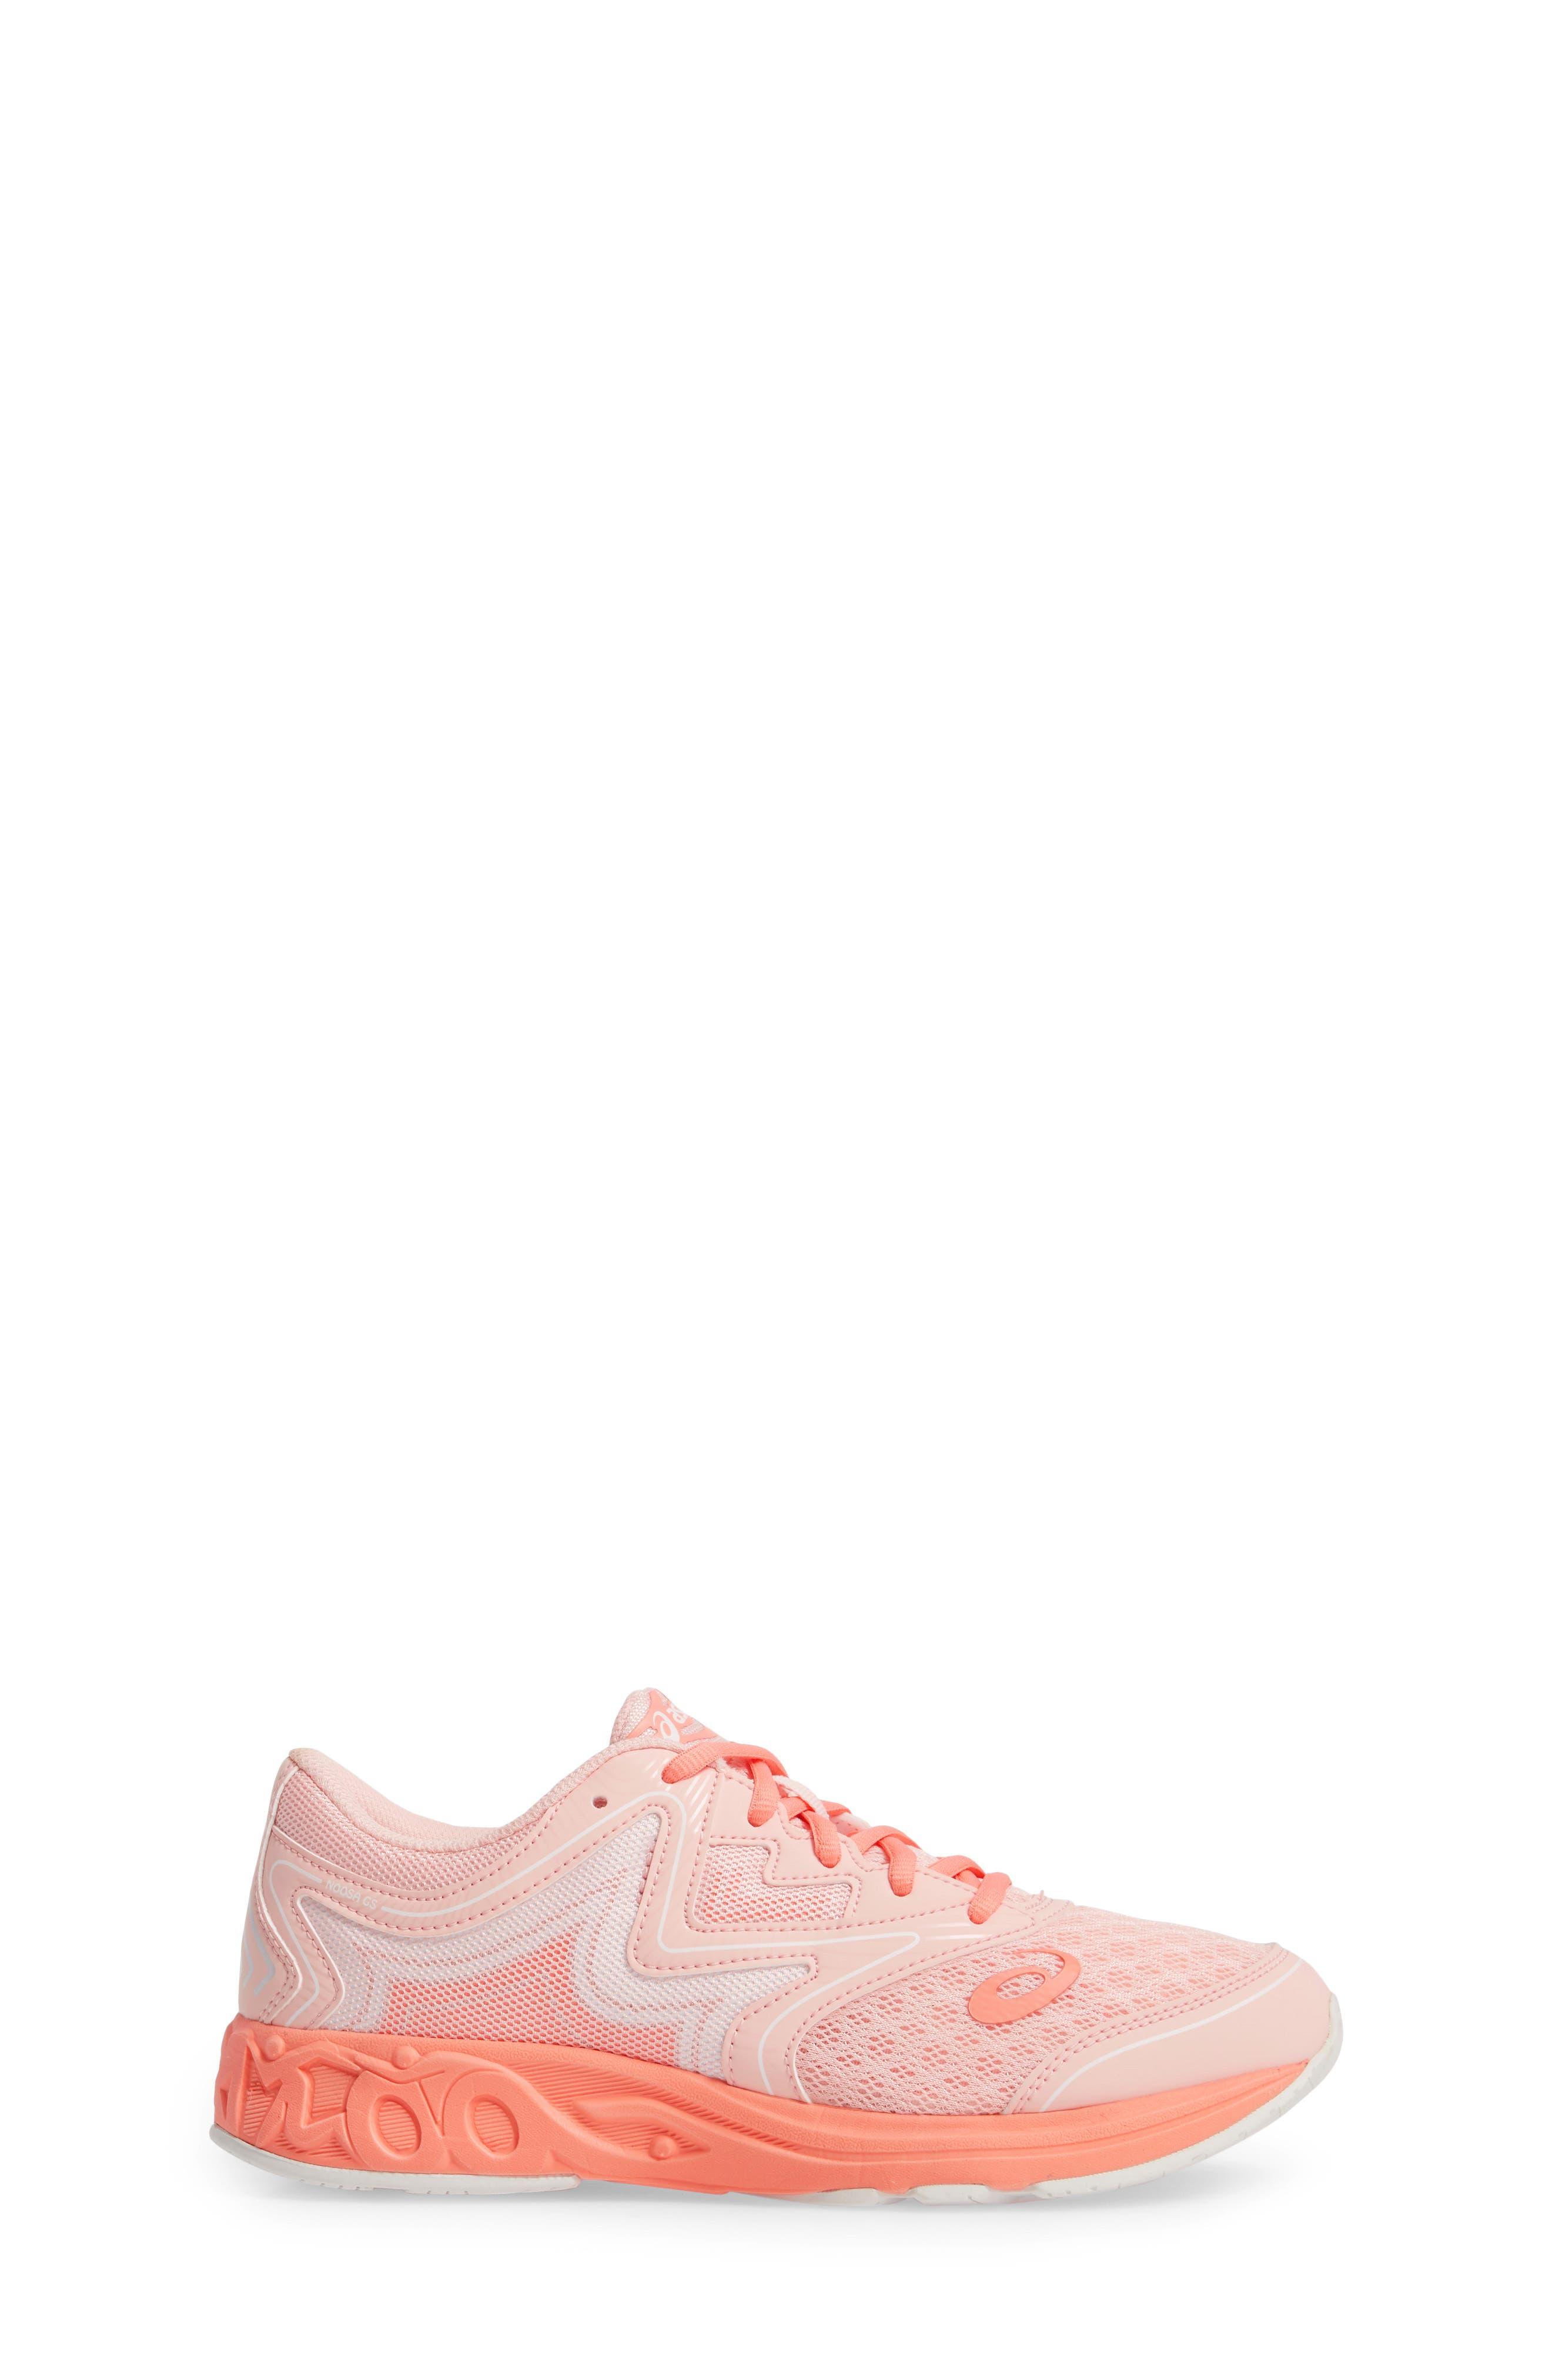 Noosa GS Sneaker,                             Alternate thumbnail 3, color,                             SEASHELL PINK/ BEGONIA/ WHITE